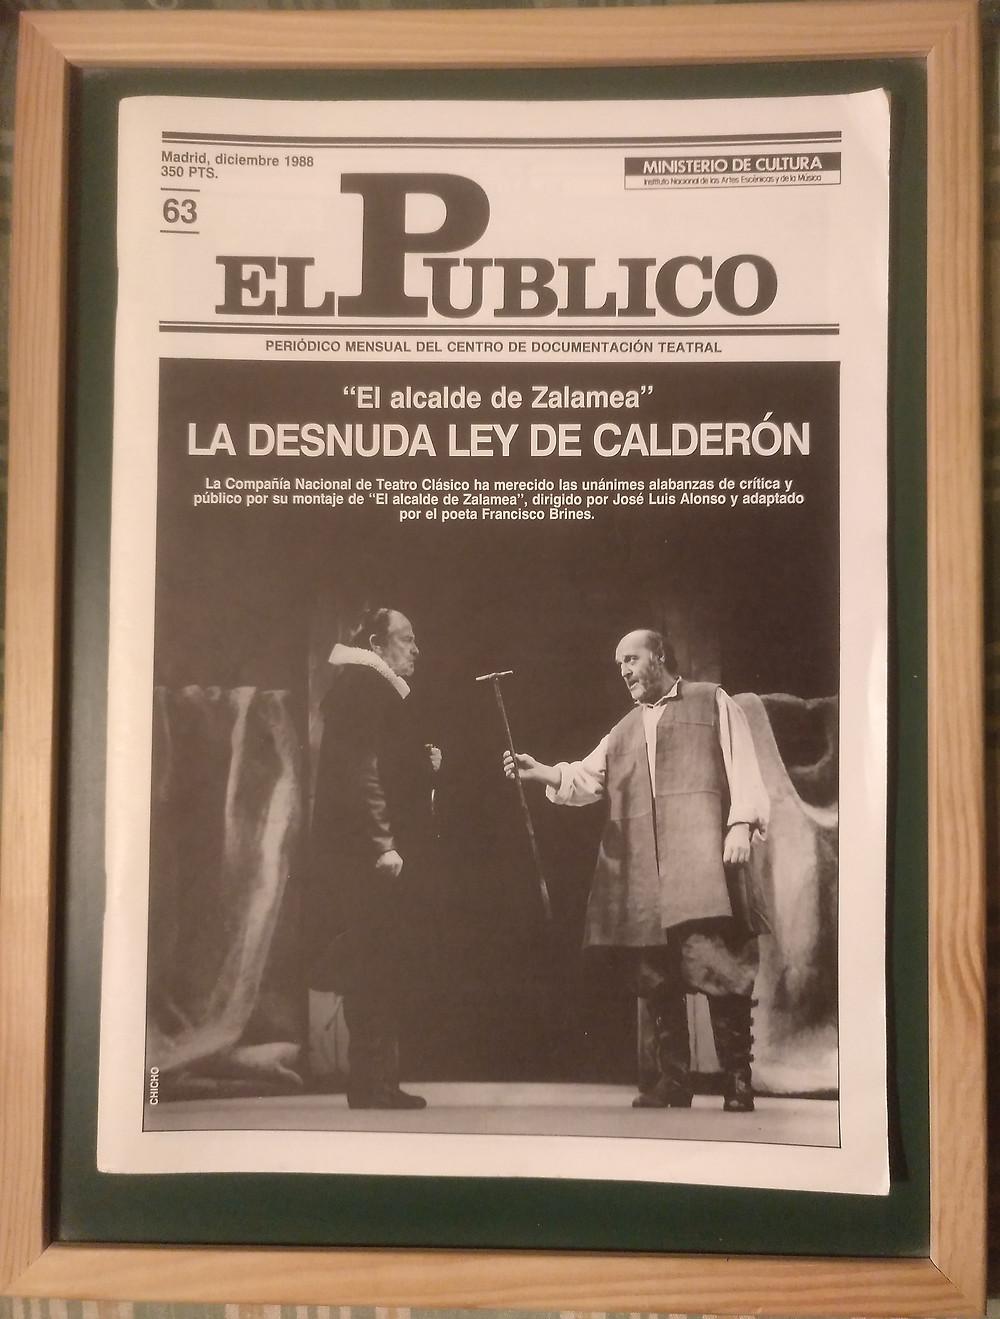 El Público. Diciembre de 1988. Nº63. Periódico Mensual del Centro de Documental Teatral. Ministerio de Cultura. Madrid.